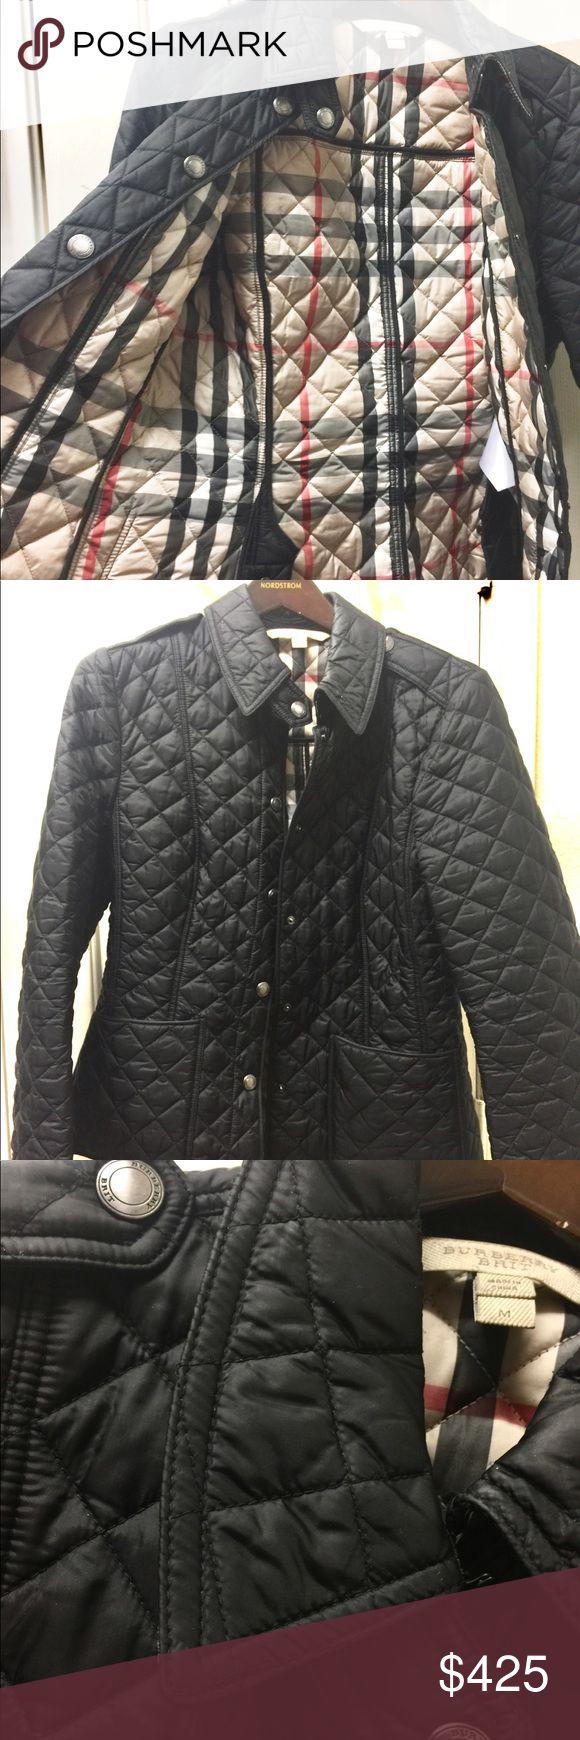 Burberry Brit Jacket Burberry Brit Jacket, barely worn! Burberry Jackets & Coats